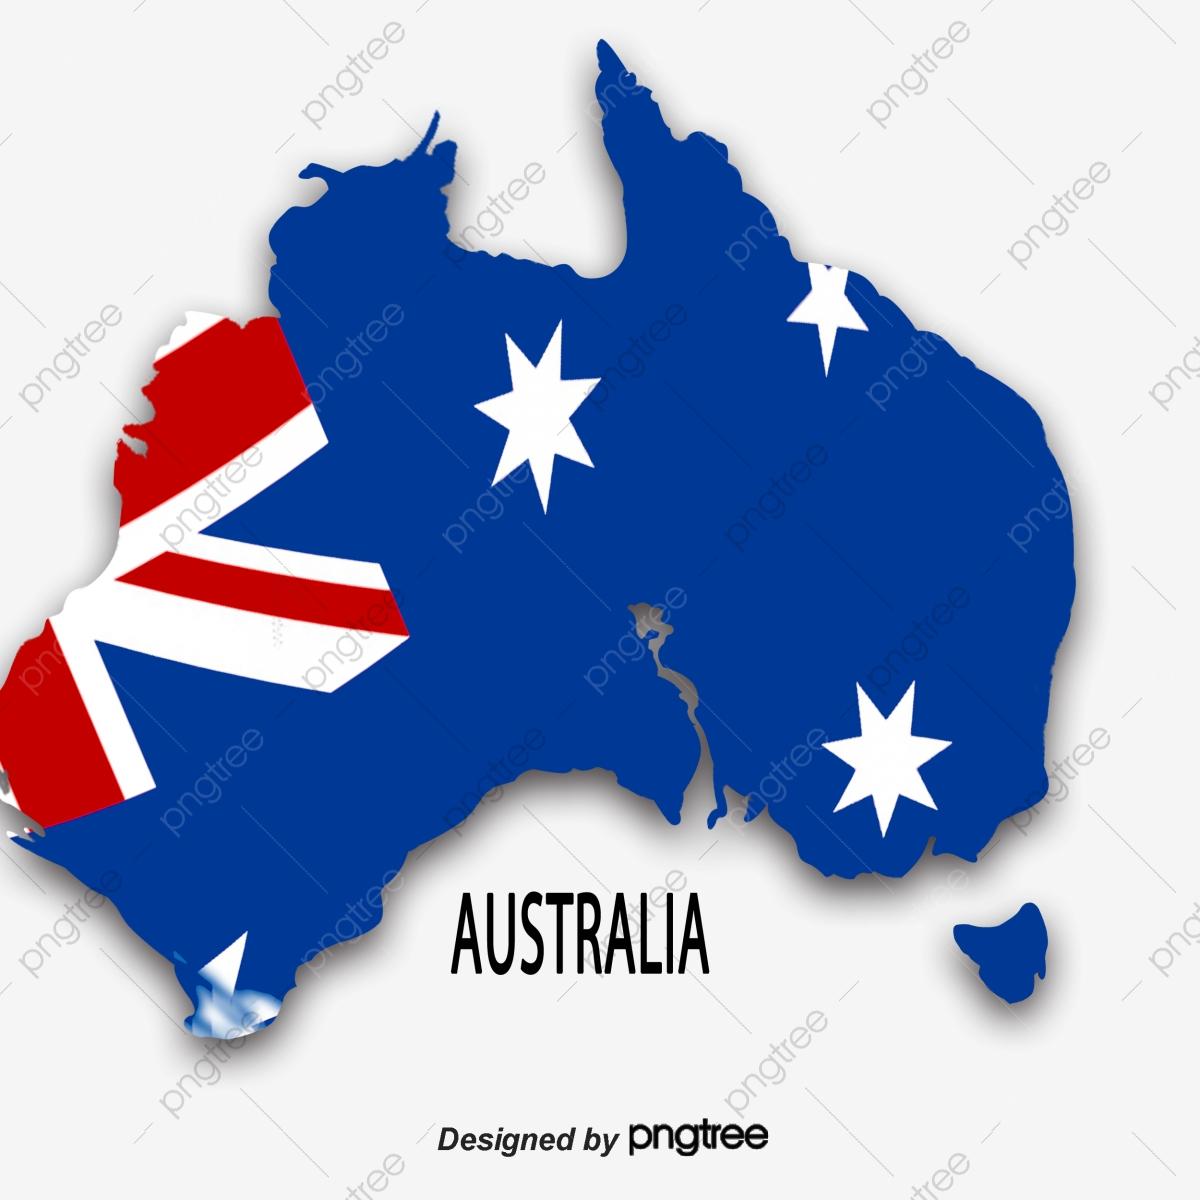 Australia clipart simple. A map of blue